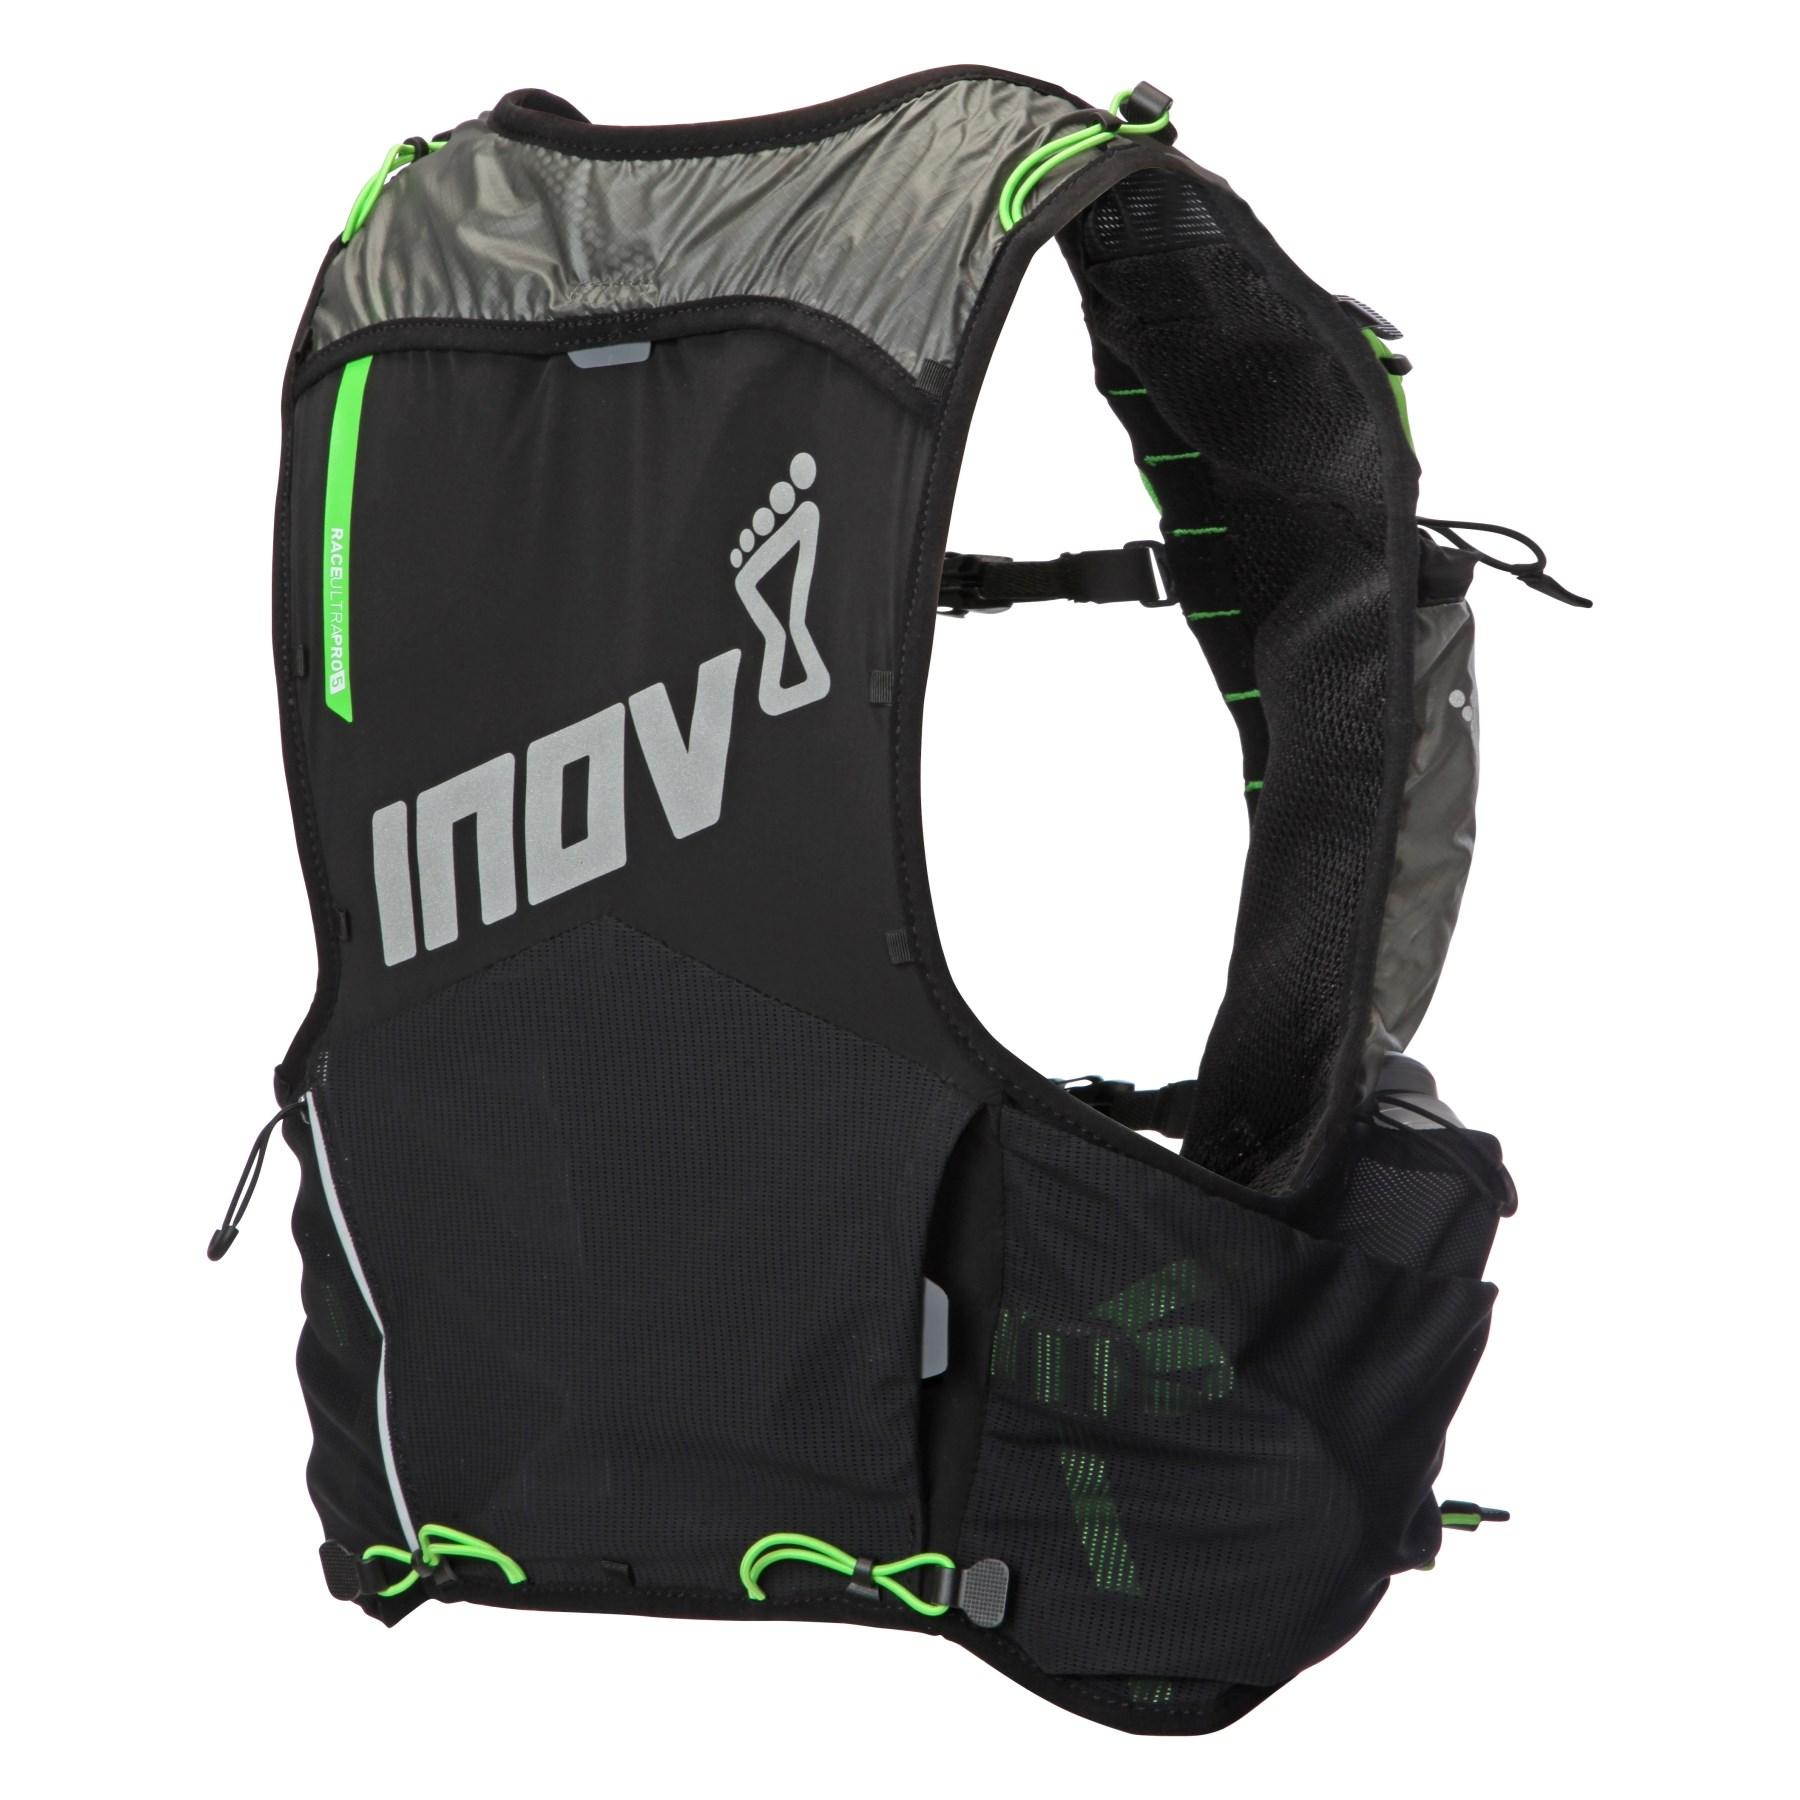 3177ff24c4 Inov-8 Race Ultra Pro 5 Vest   Black / Green